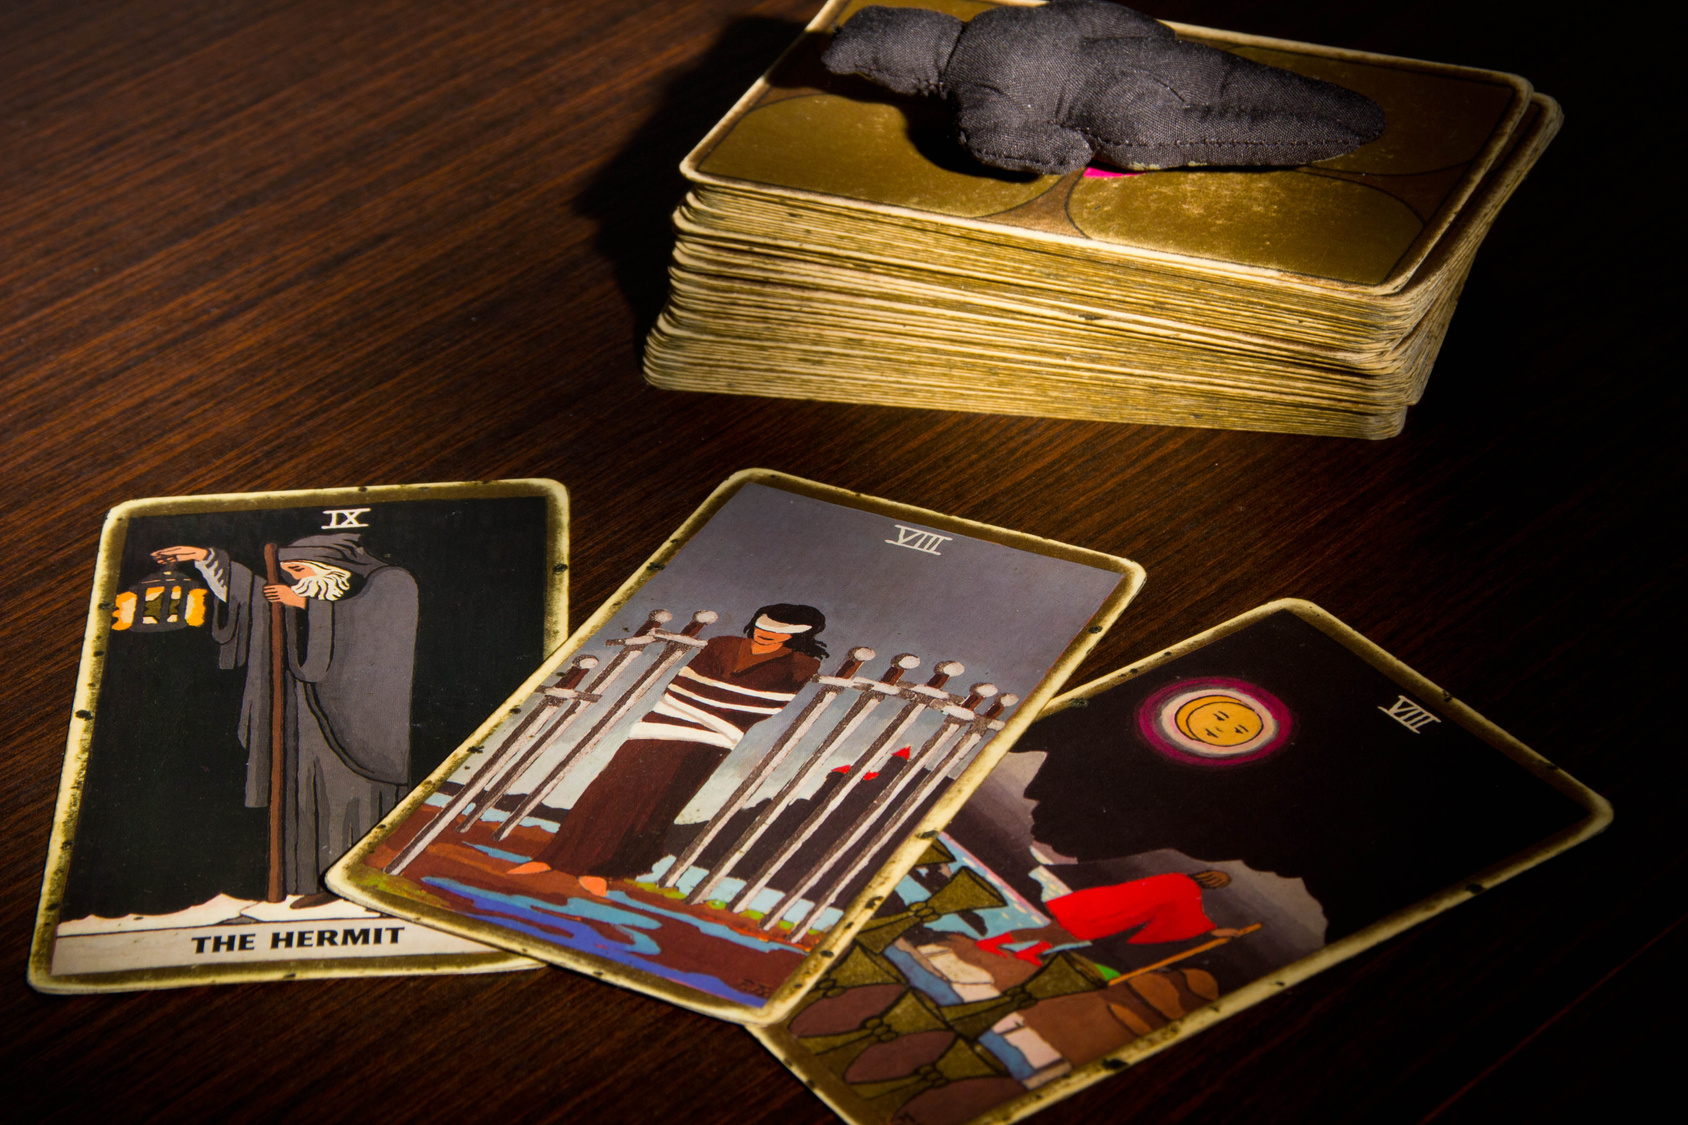 Расклад Таро 3 карты - волшебство ответов